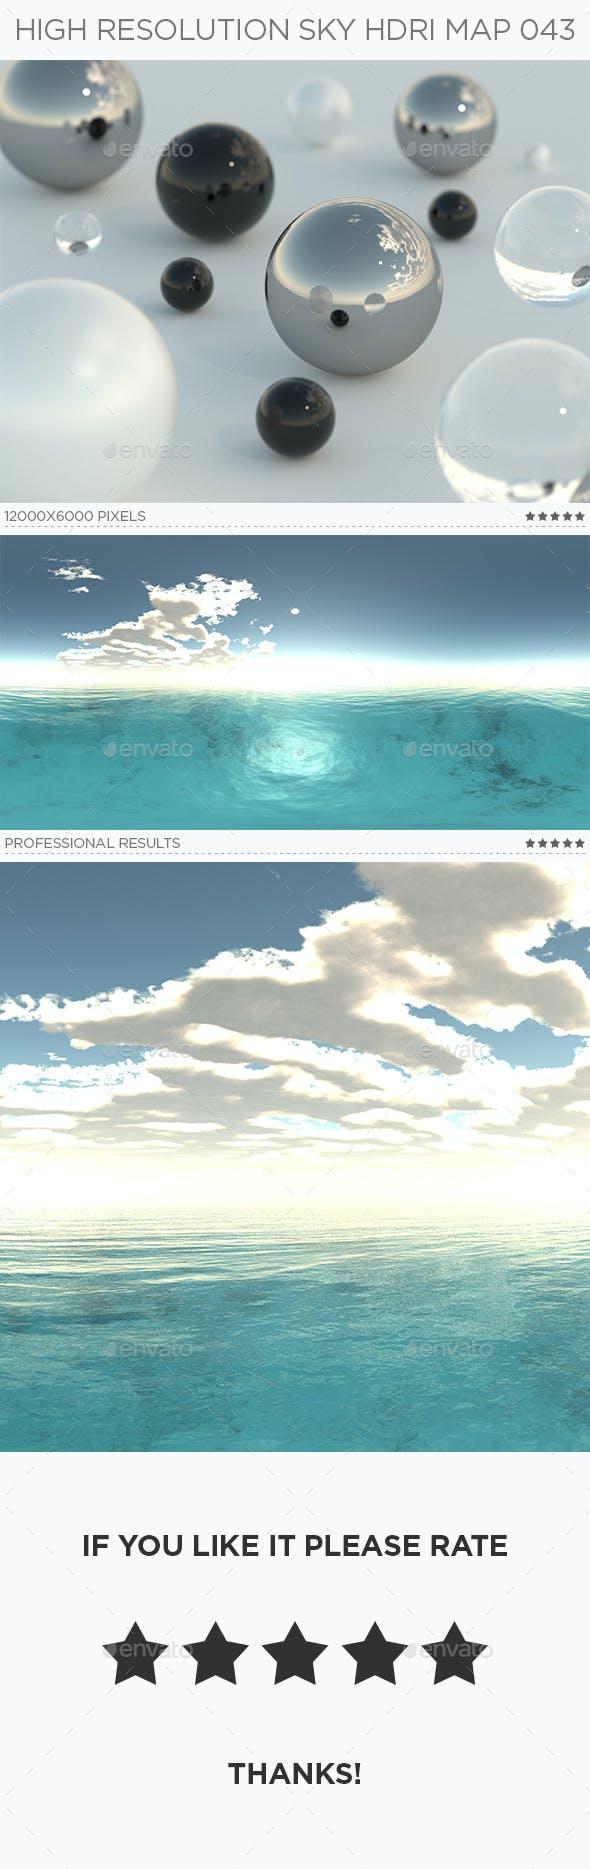 High Resolution Sky HDRi Map 043 - 3DOcean Item for Sale